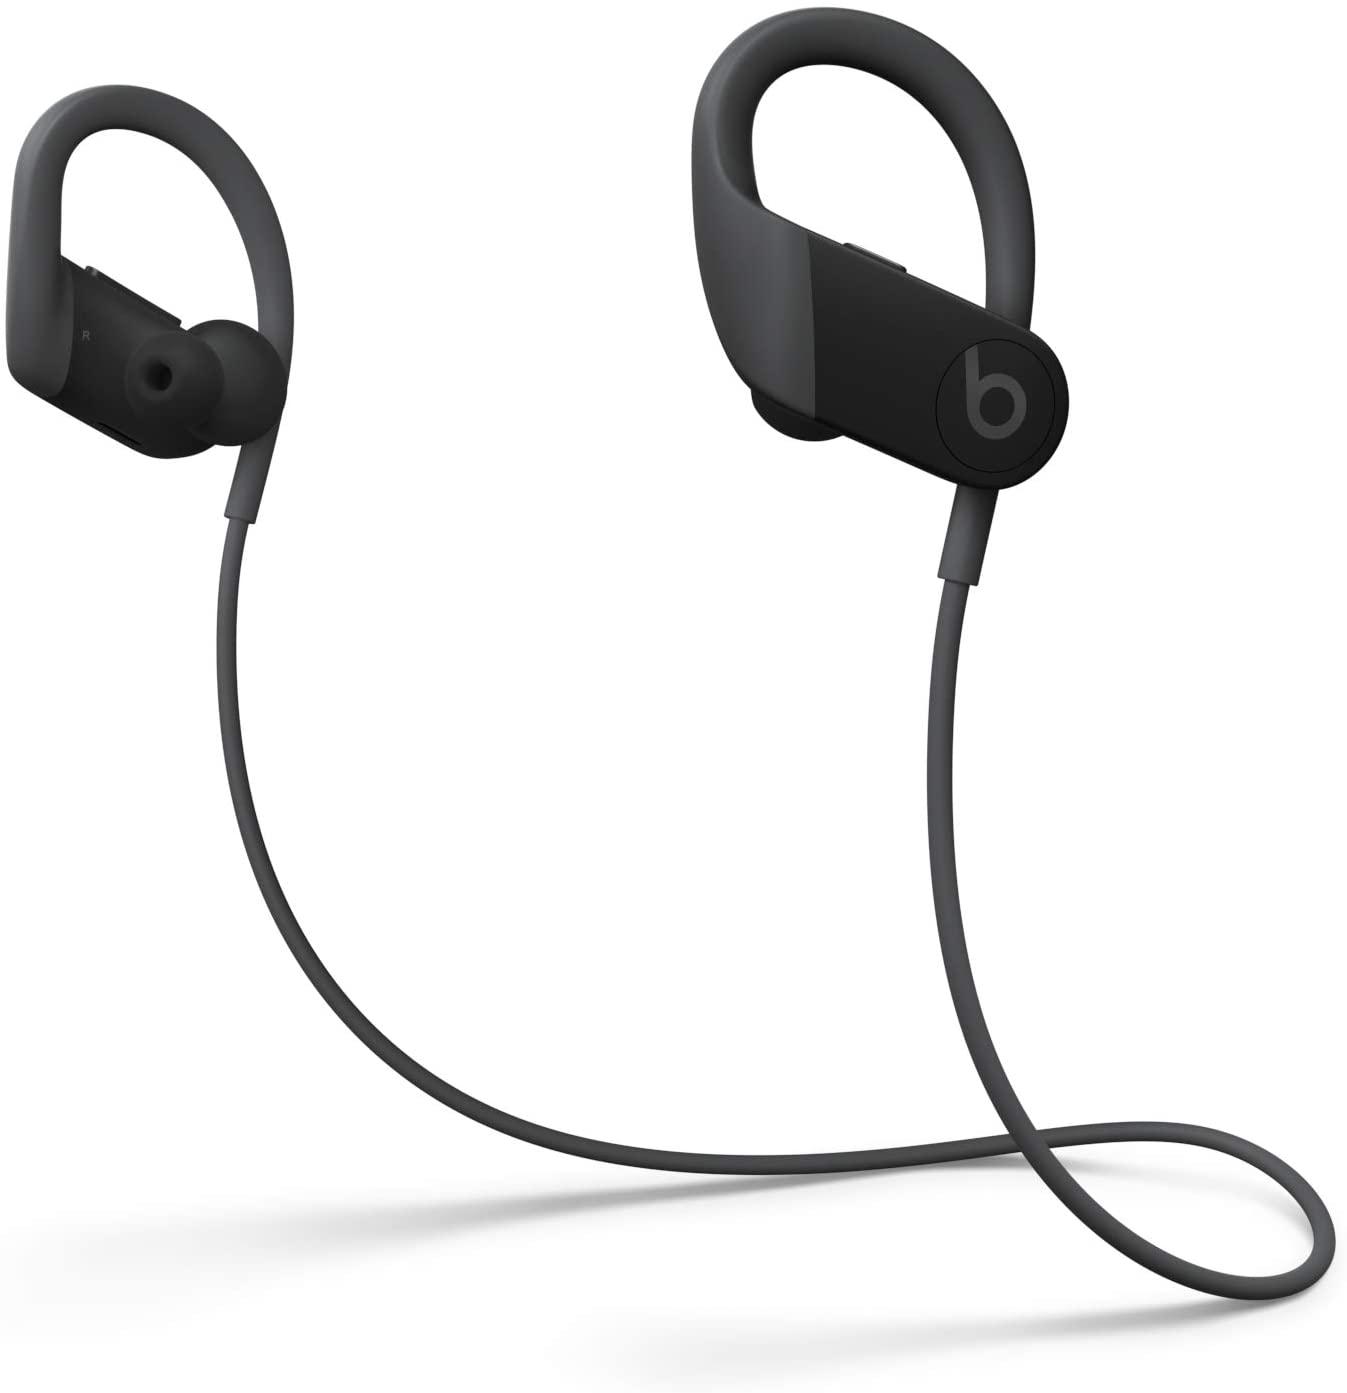 Power Beats High Wireless Performance Earphones